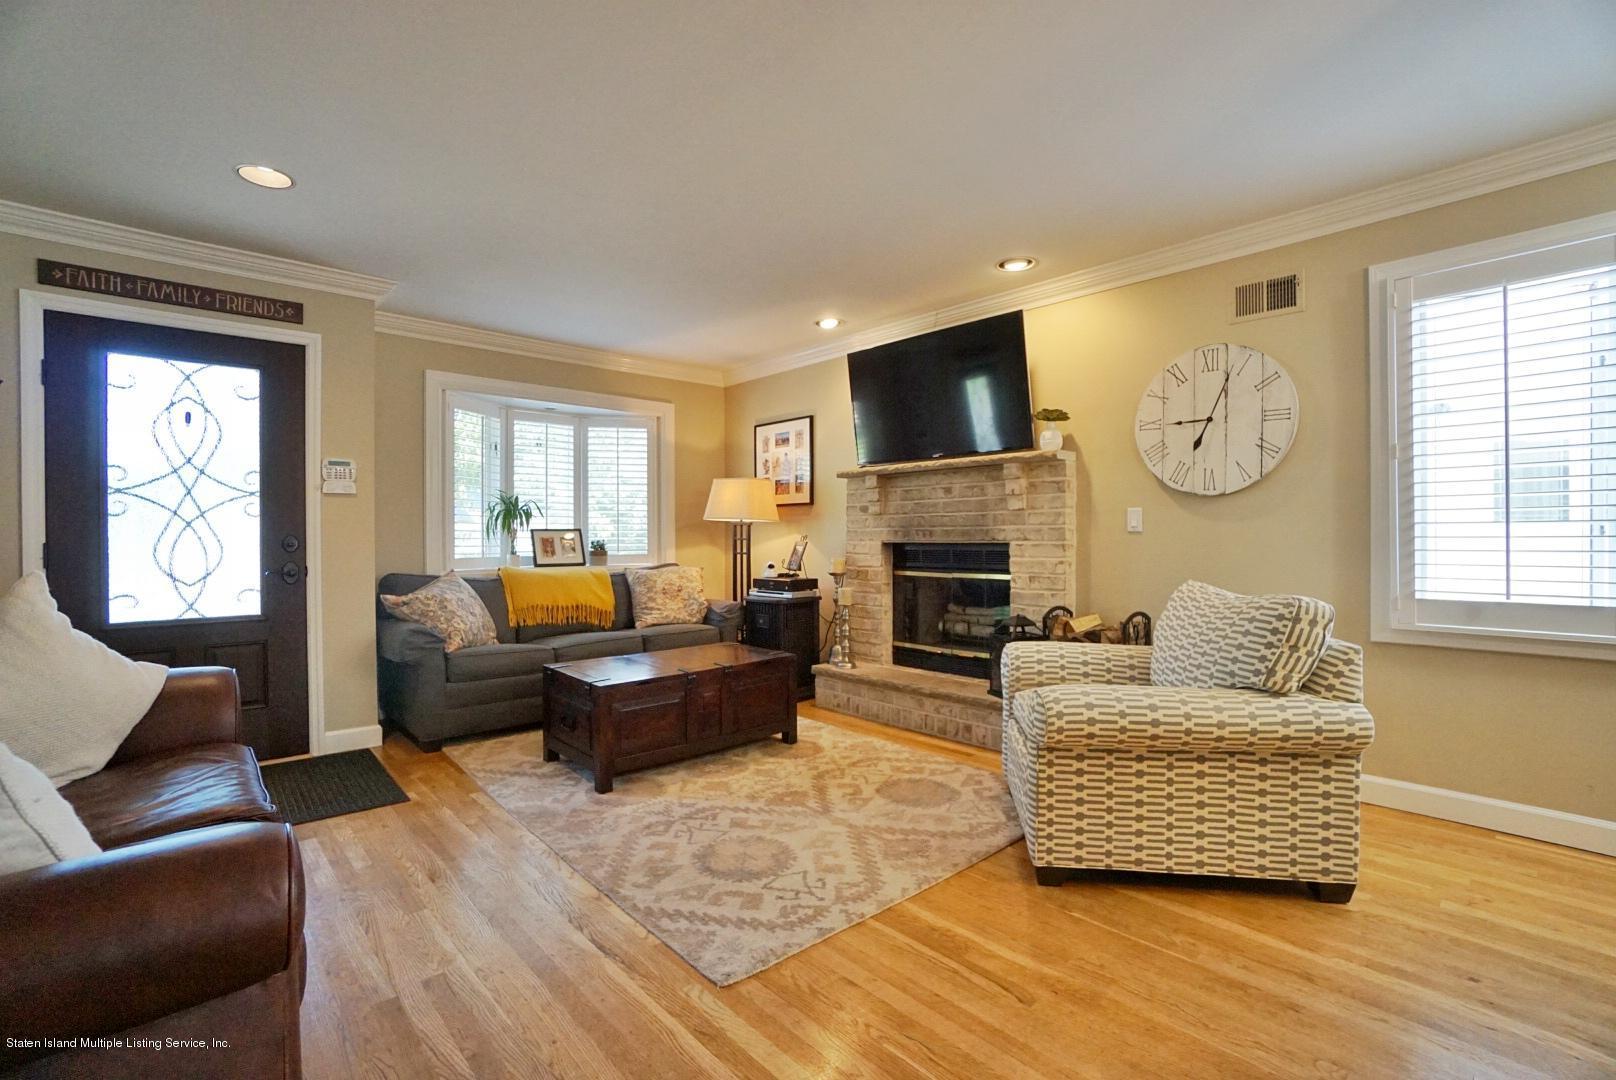 Single Family - Semi-Attached 66 Reading Avenue  Staten Island, NY 10312, MLS-1132256-4